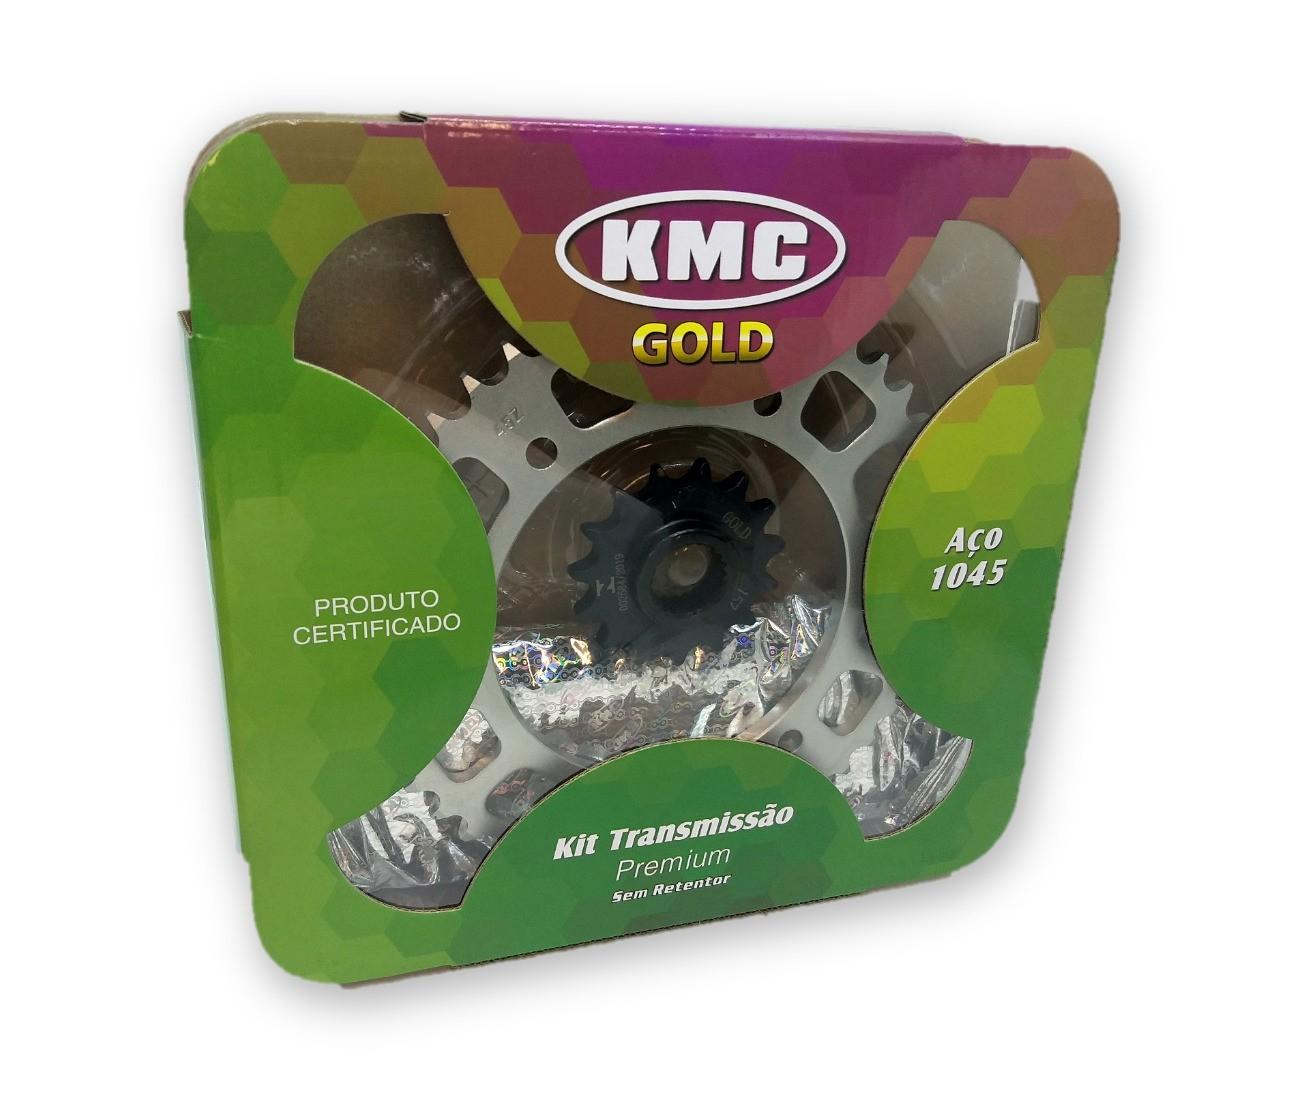 Kit Relação Fazer 250 2014 Aço 1045 KMC GOLD 428x132x45x15